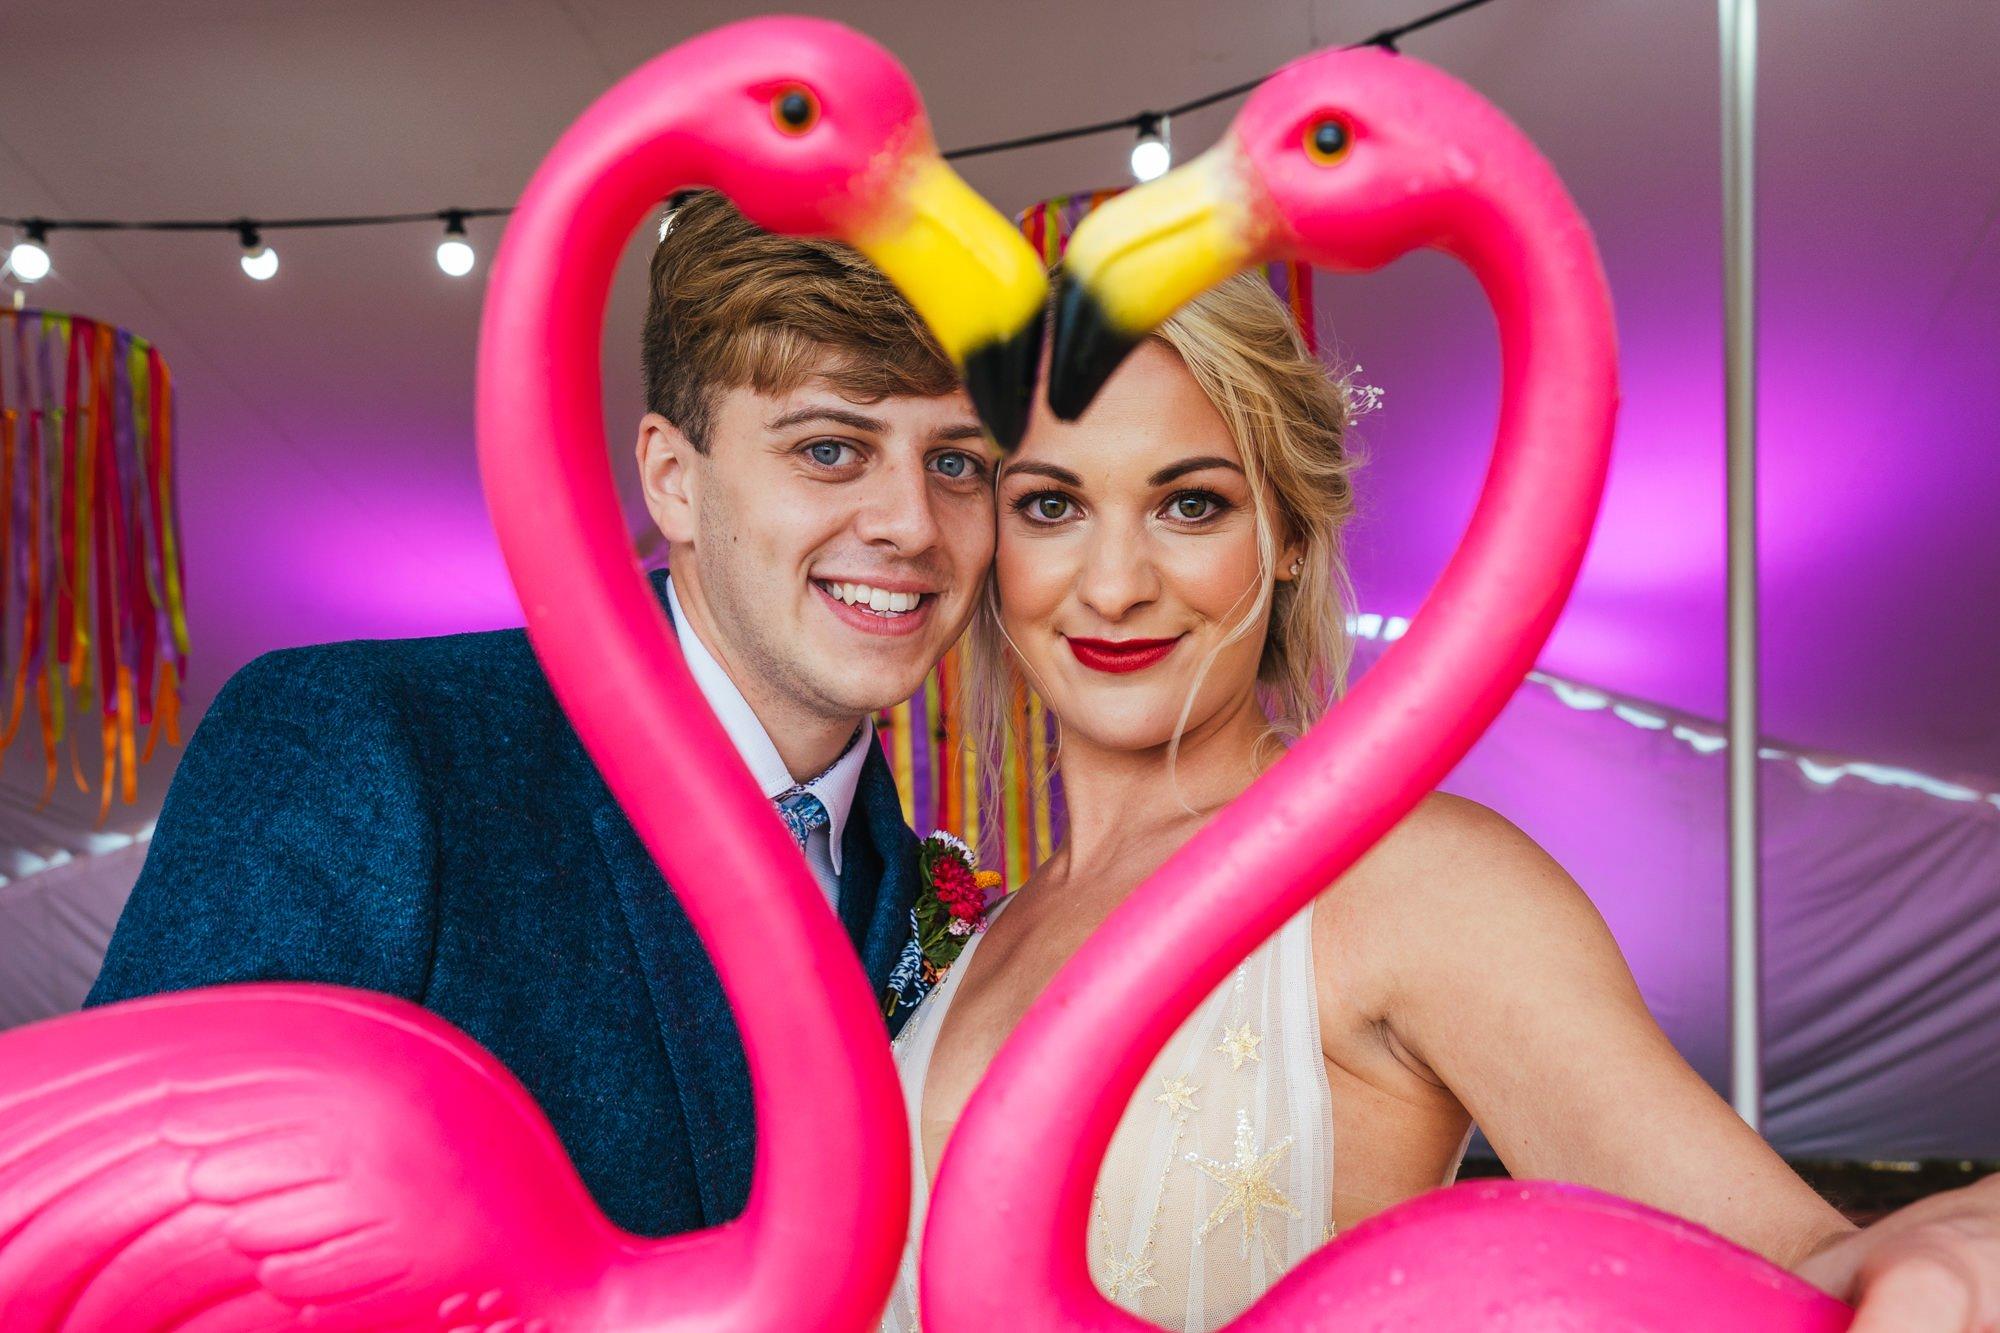 Fun wedding photography - Couple posing with flamingos